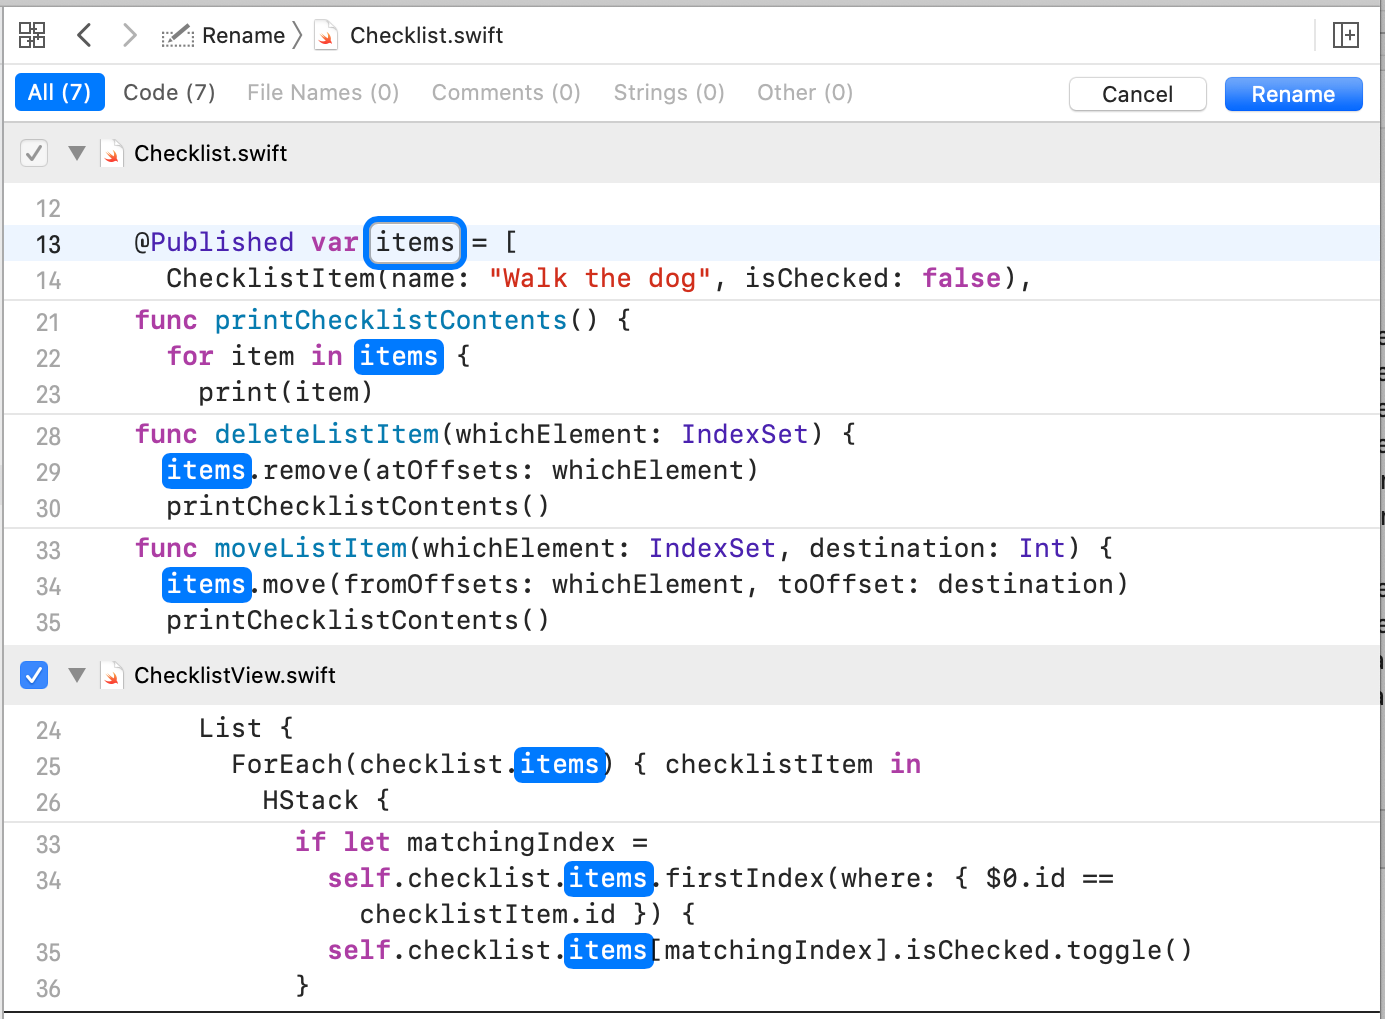 Renaming 'checklistItems' to ''items